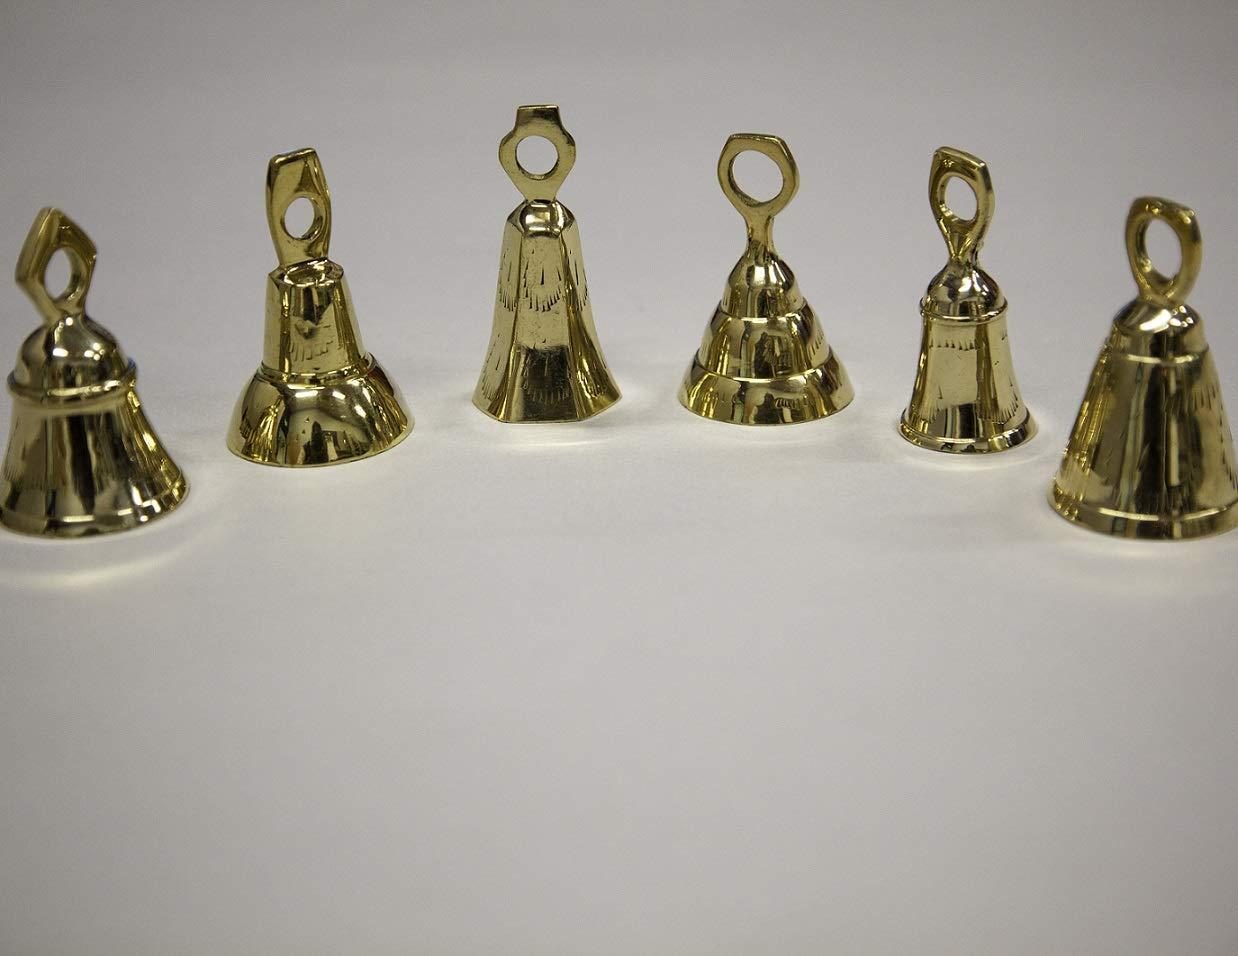 Arts Of Creation 3''- Assorted Brass Bells Vintage Bronze Jingle Bells One Dozen For Dog Doorbell Temple Bell Wedding gift christmas gift temple decor musical instrument sound diwali Decoration